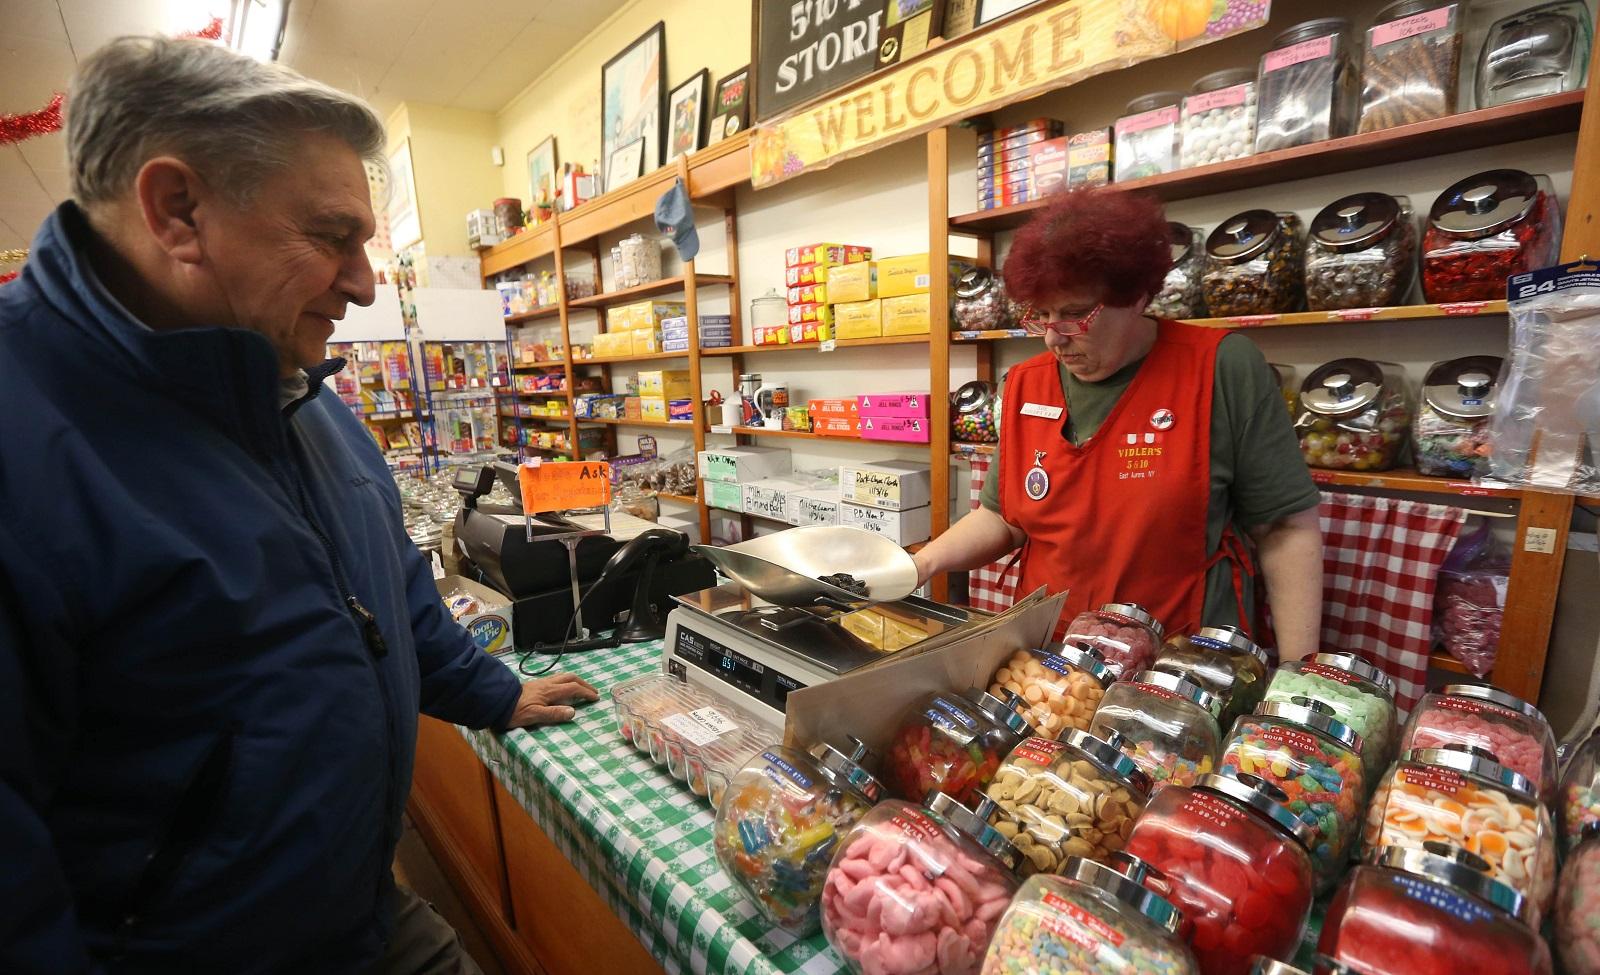 Clerk Sue Yoerk serves customer Dennis Caldwell, of Hamburg, at the candy counter. (Sharon Cantillon/Buffalo News)